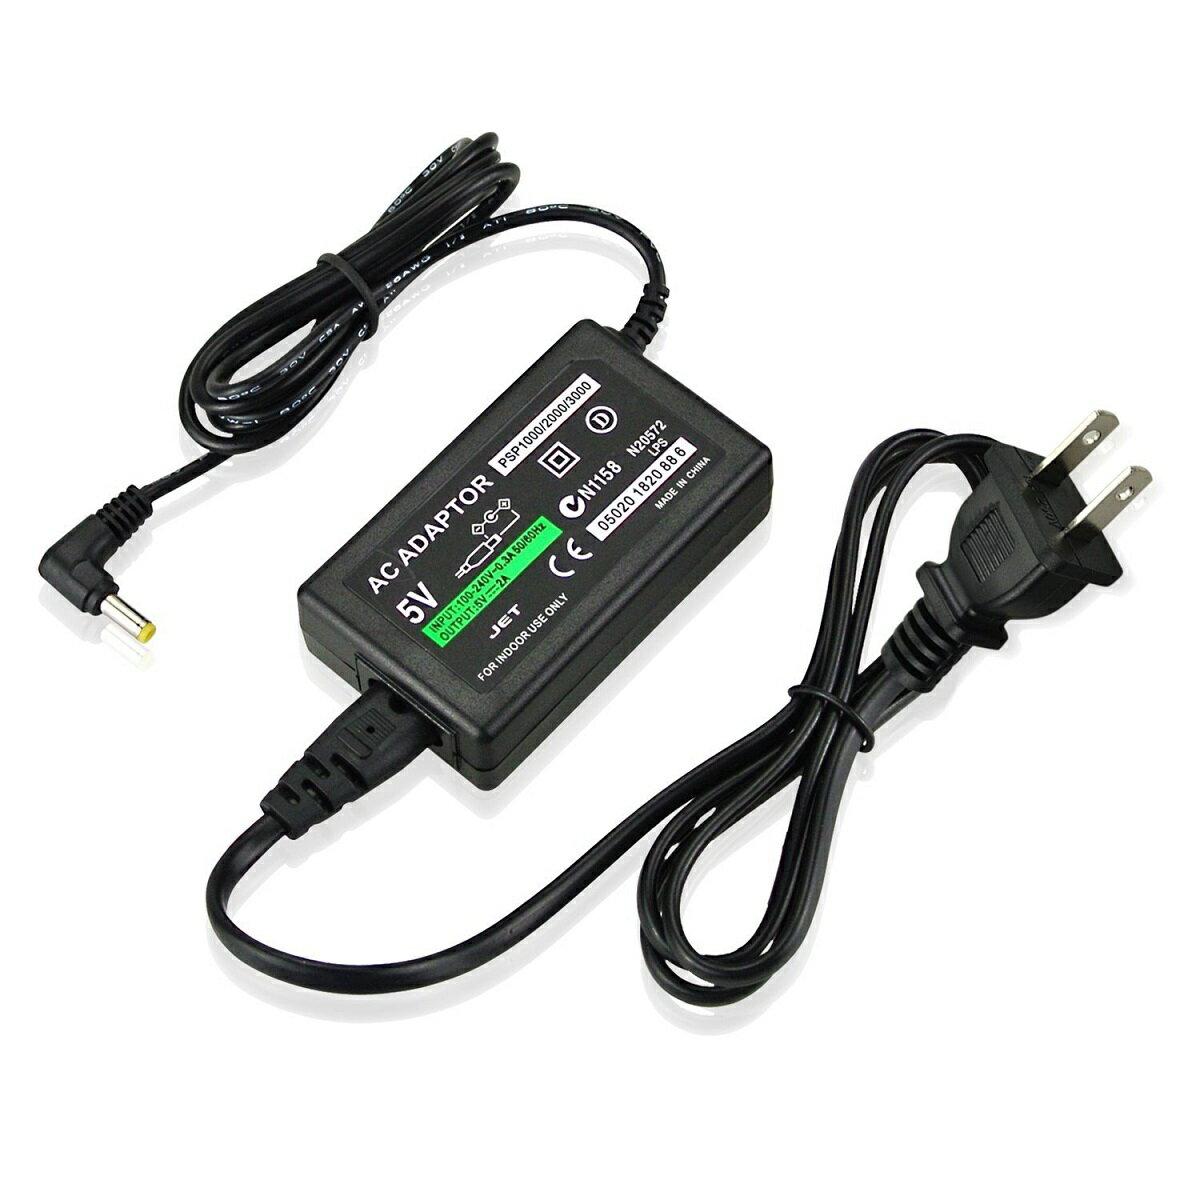 PSP 充電器 ACアダプター家庭用コンセント接続タイプ PSP-1000・PSP-2000・PSP-3000対応アクセサリ充電器 ACアダプター